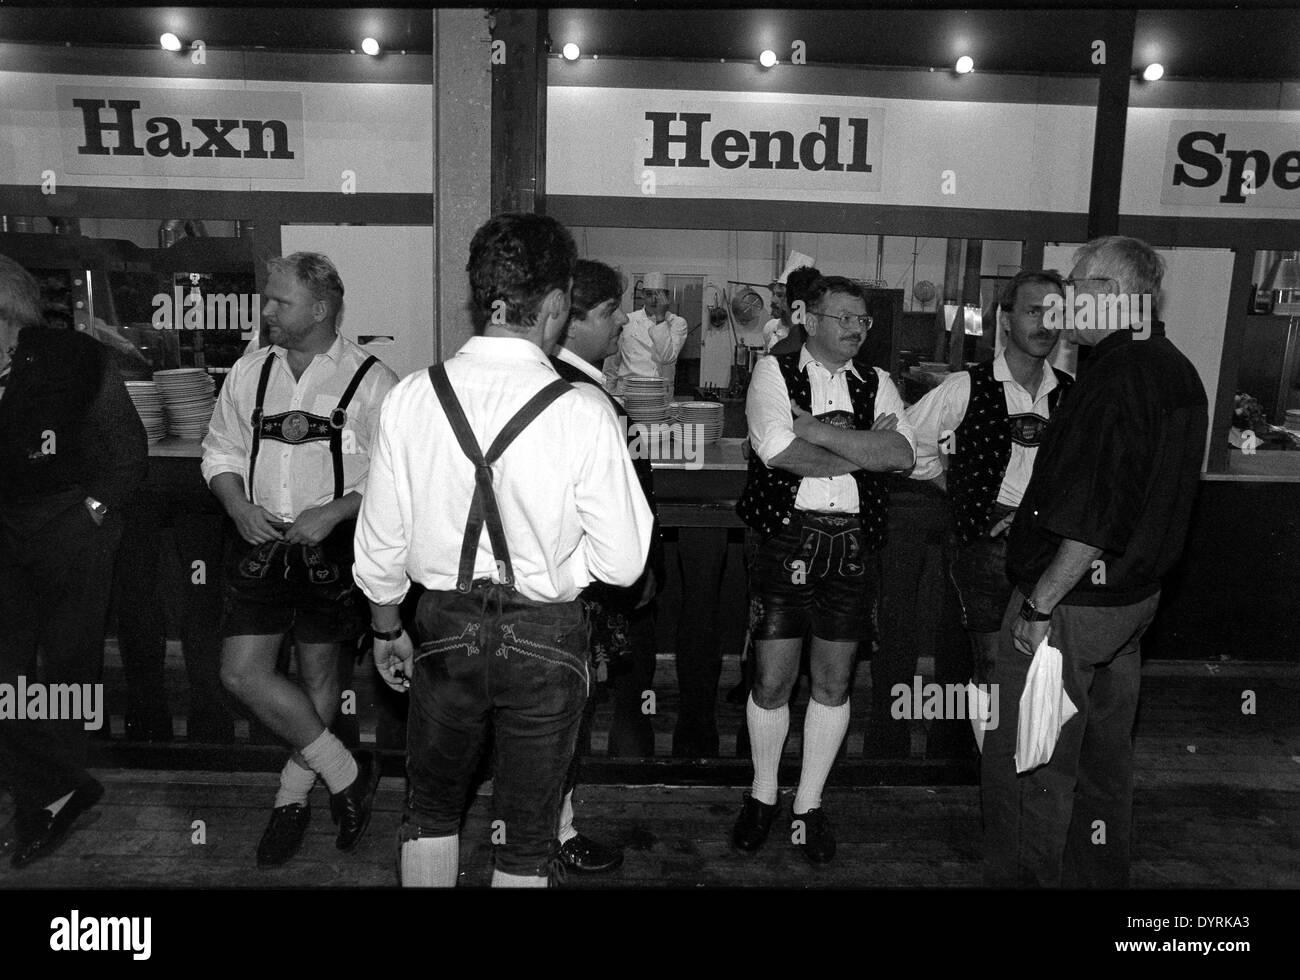 Waiter at the Oktoberfest, 1998 - Stock Image